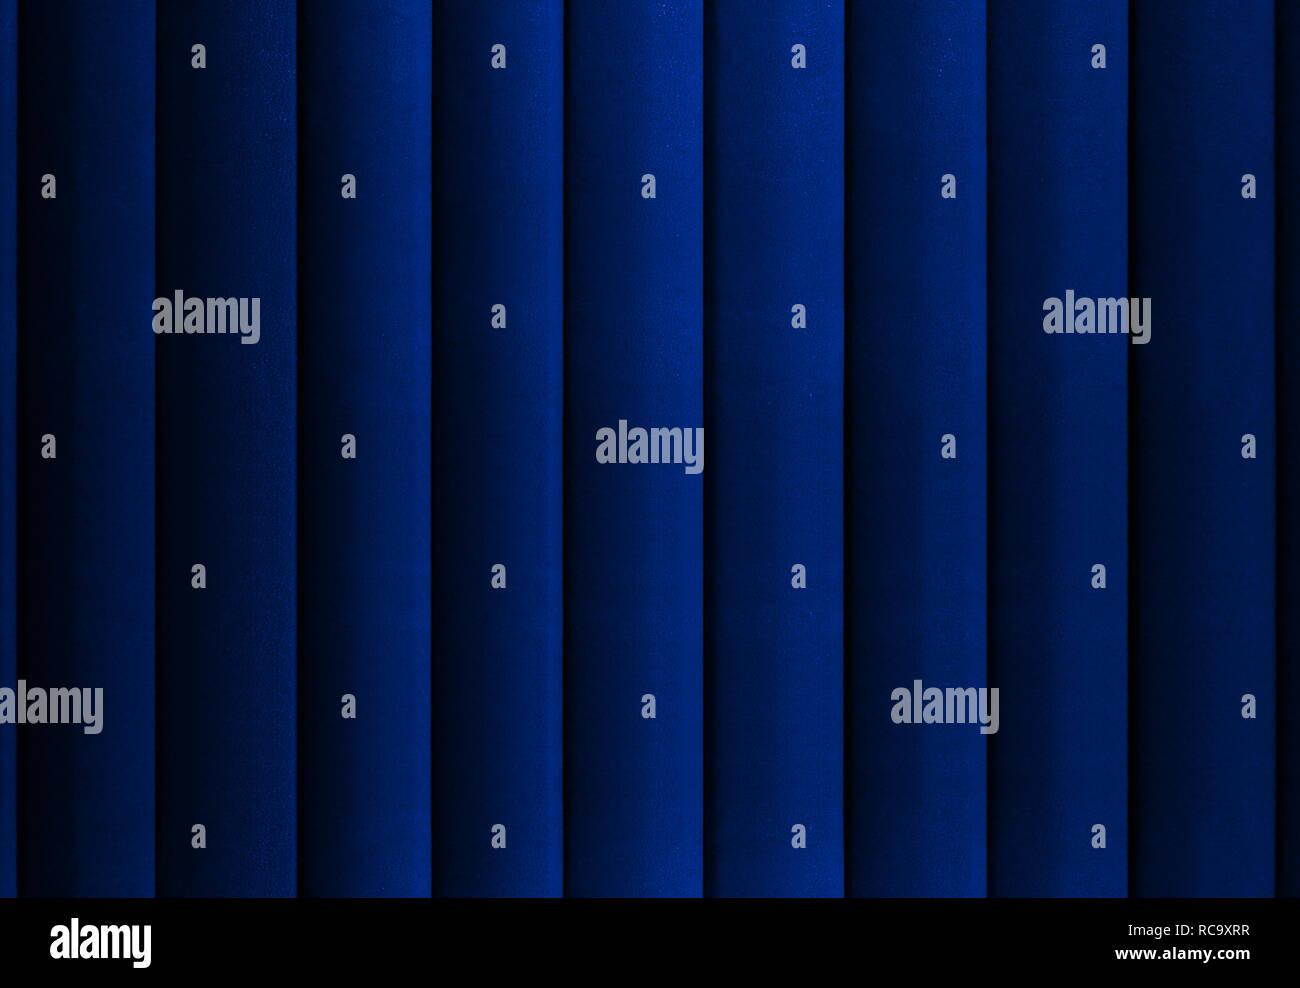 Blue curtain background - Stock Image